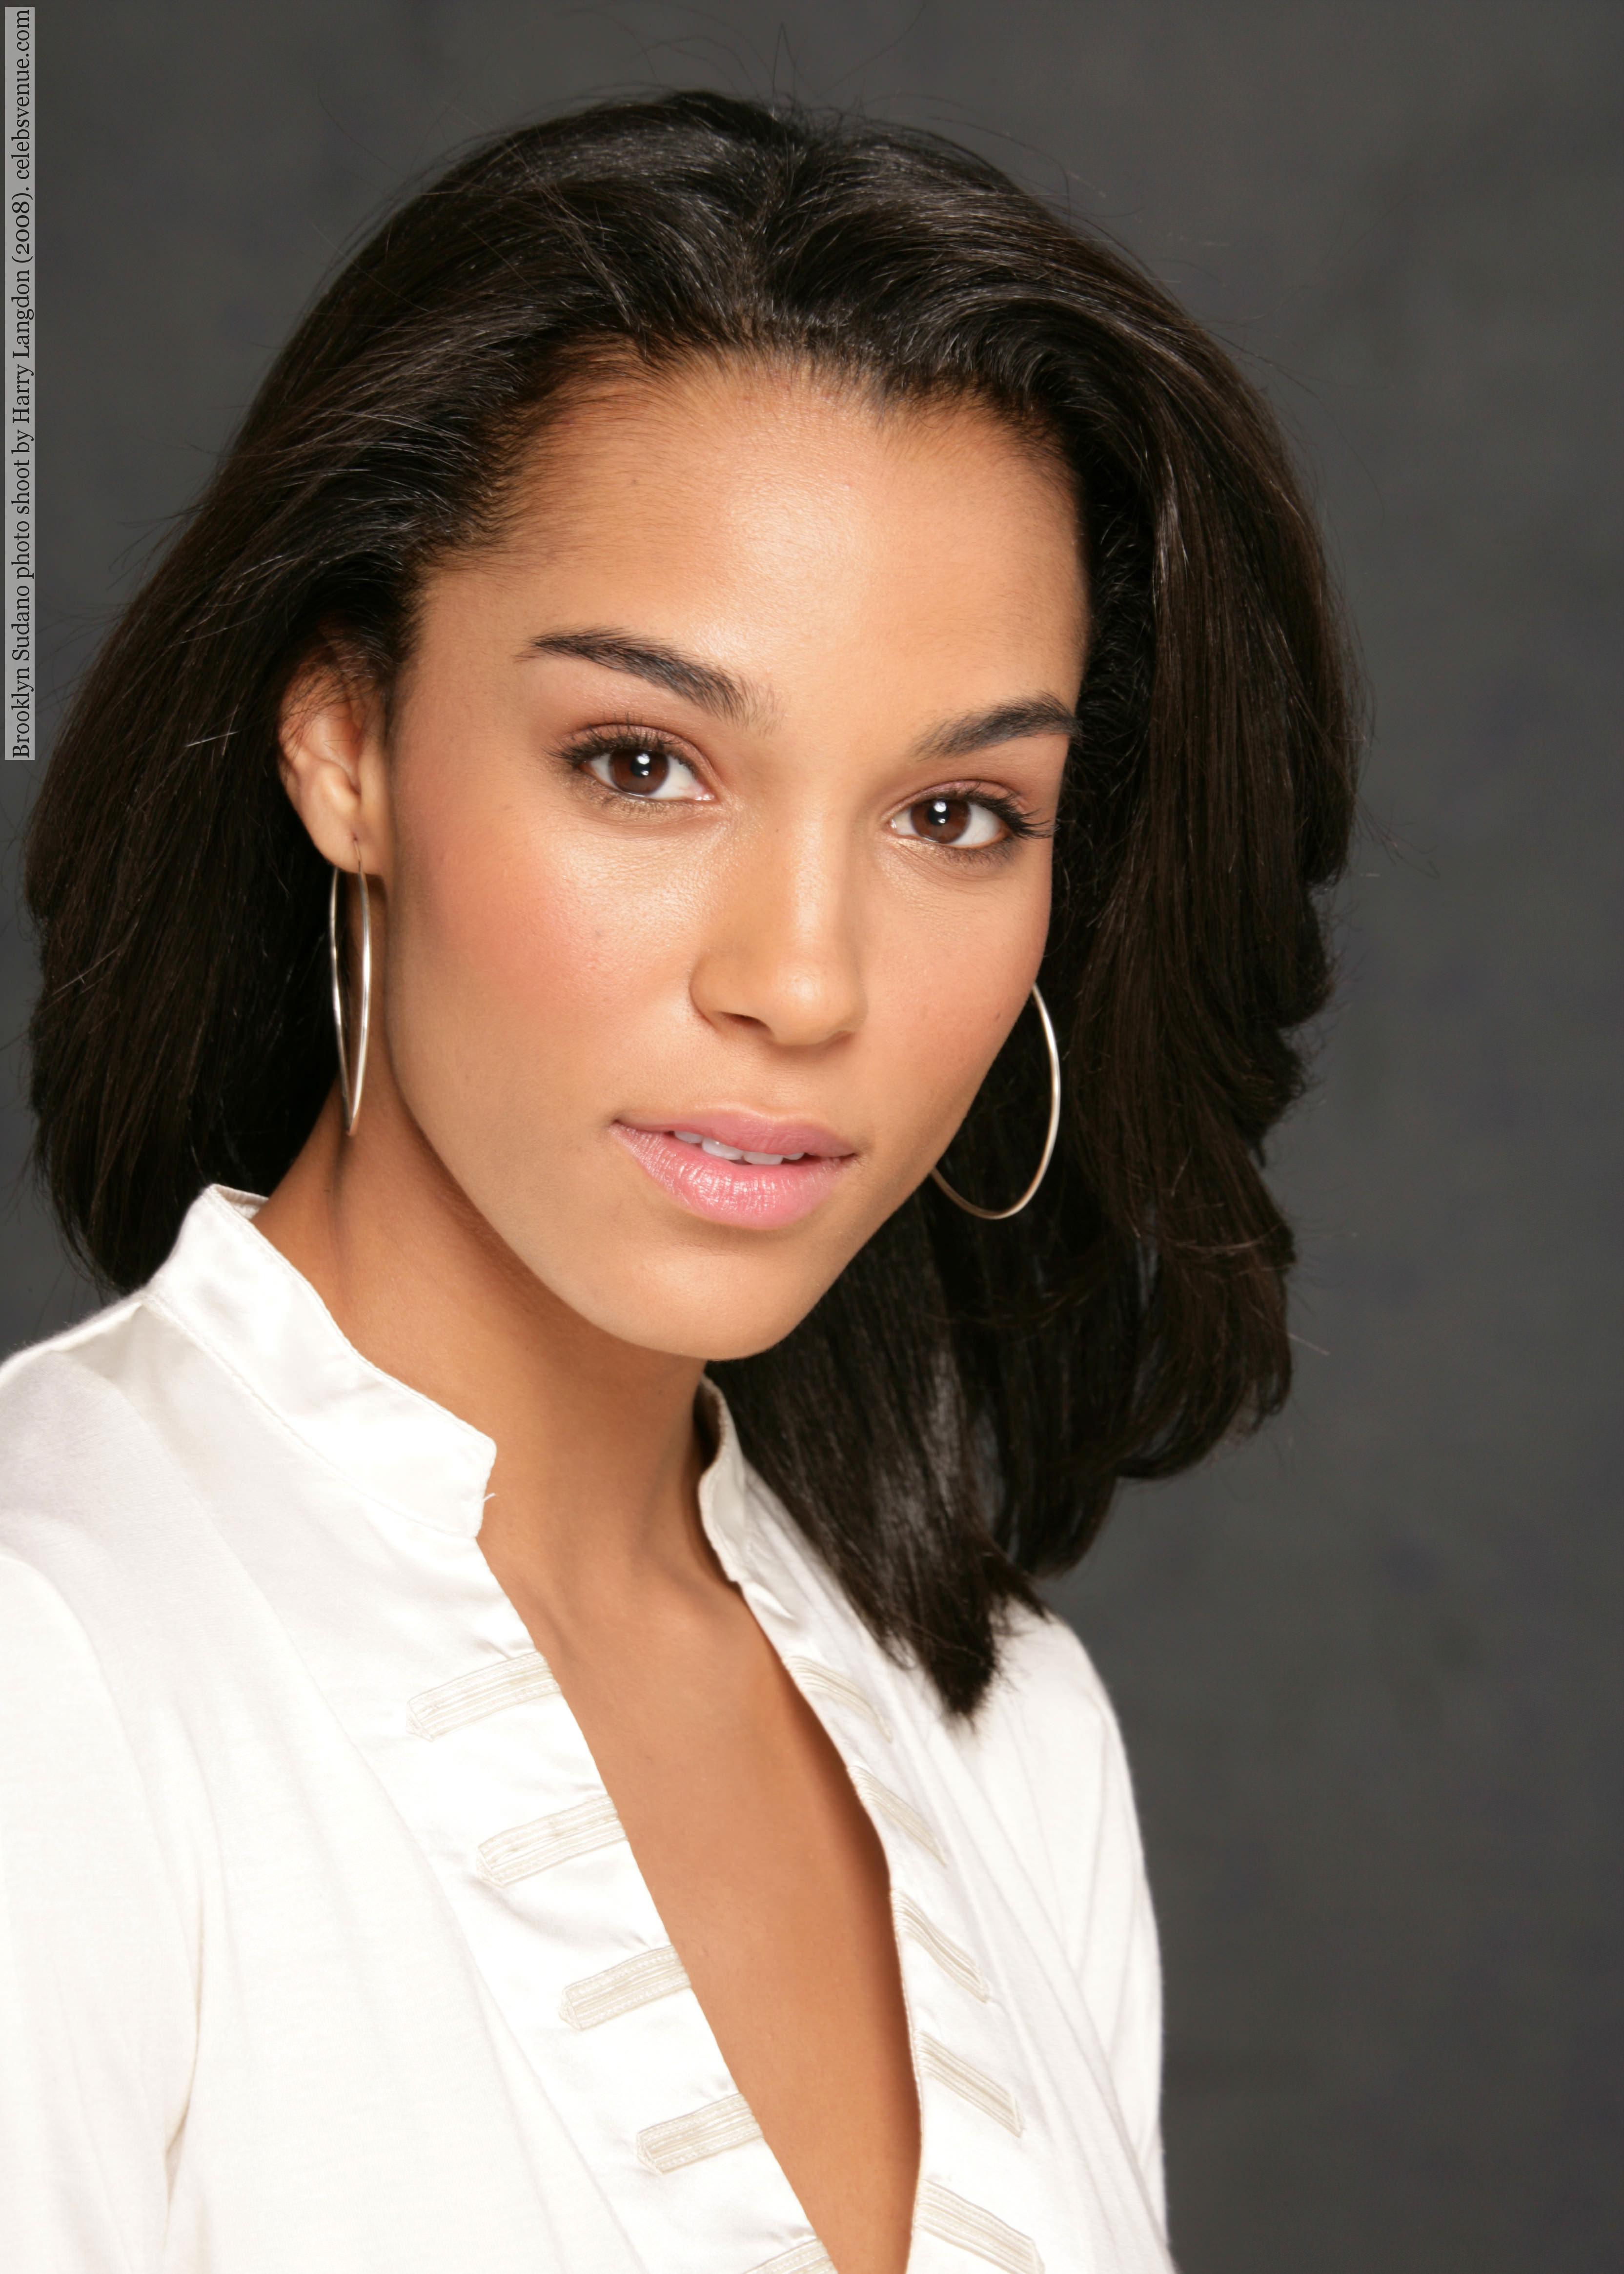 TV Actress Brooklyn Sudano - age: 36